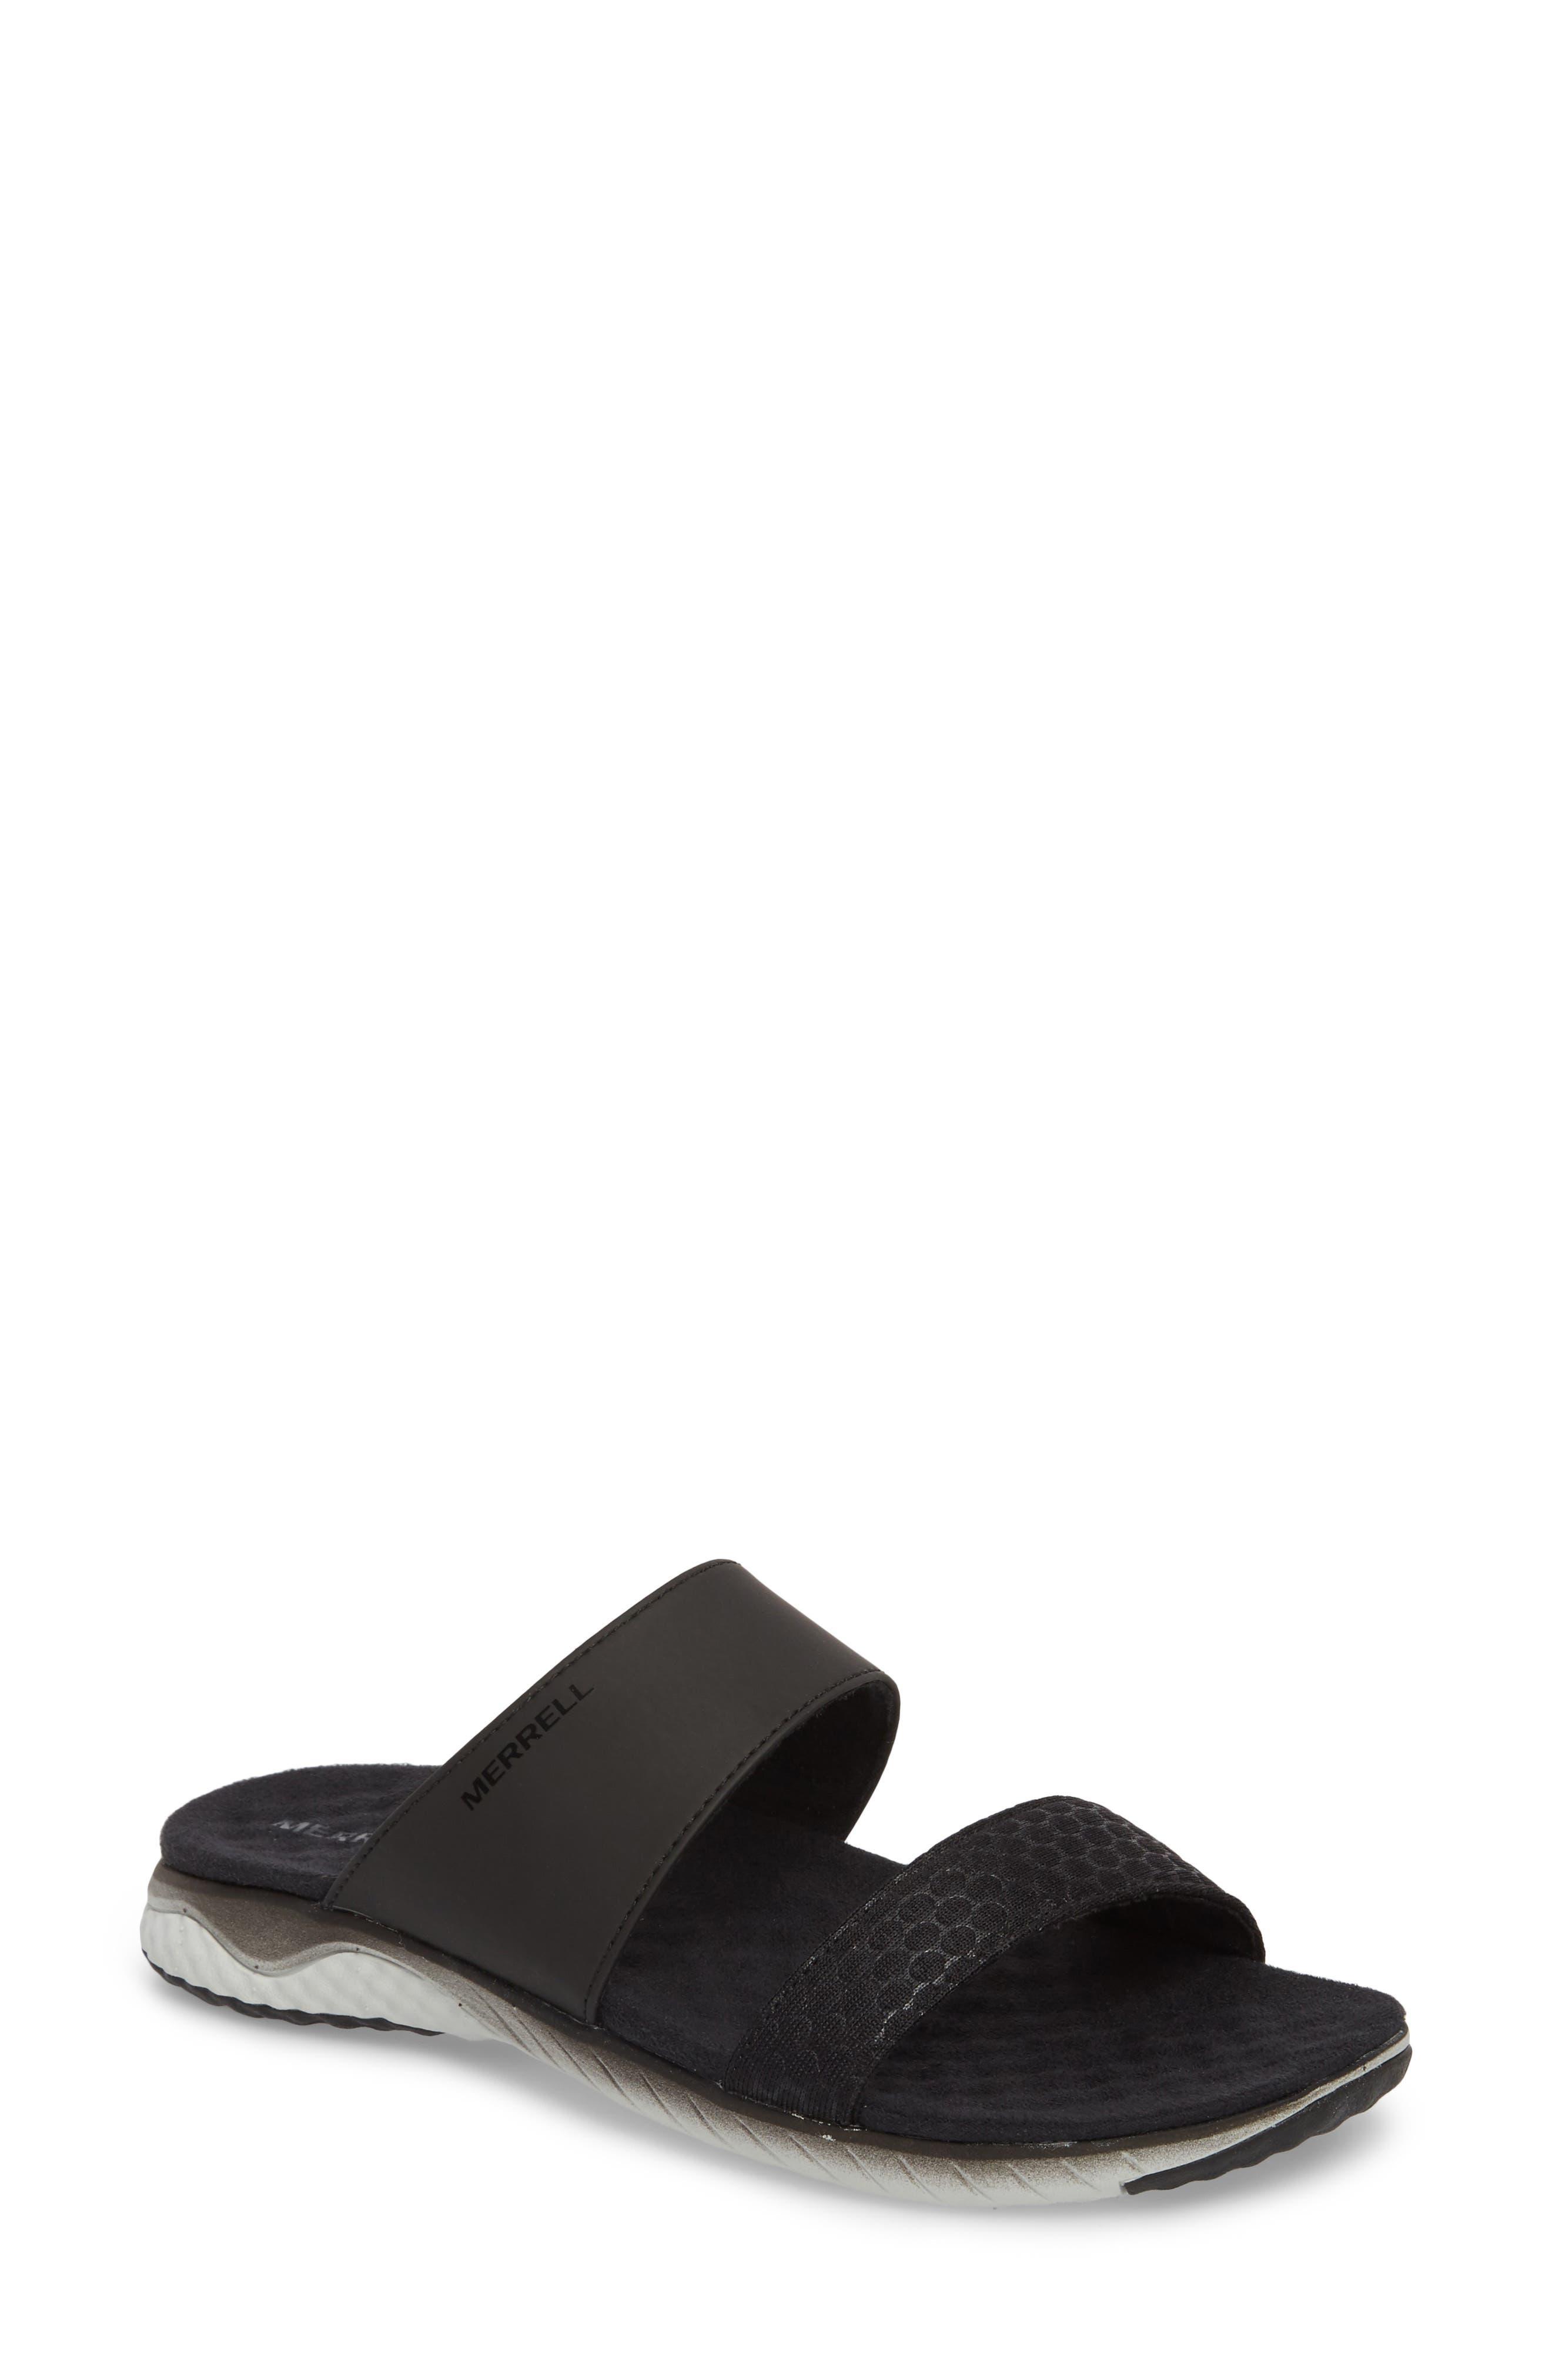 1SIX8 Linna Air Cushion+ Slide Sandal,                         Main,                         color,